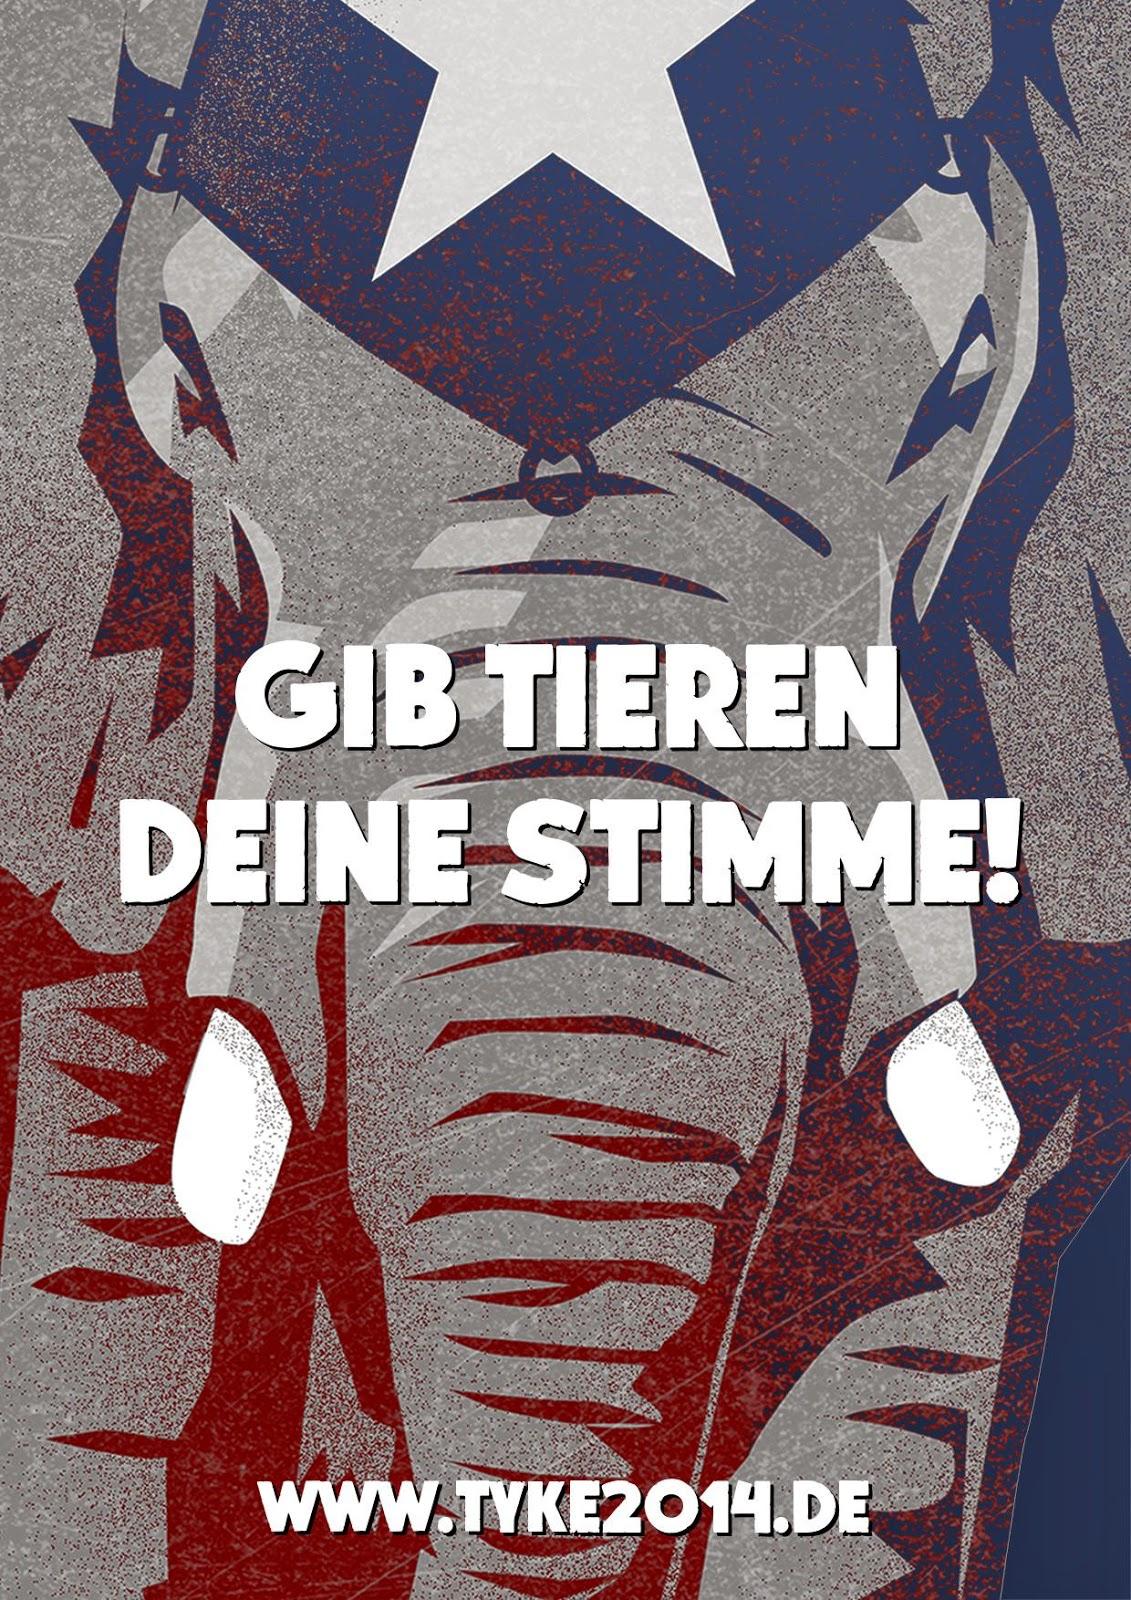 http://tyke2014.de/?pk_campaign=Update2#home-header